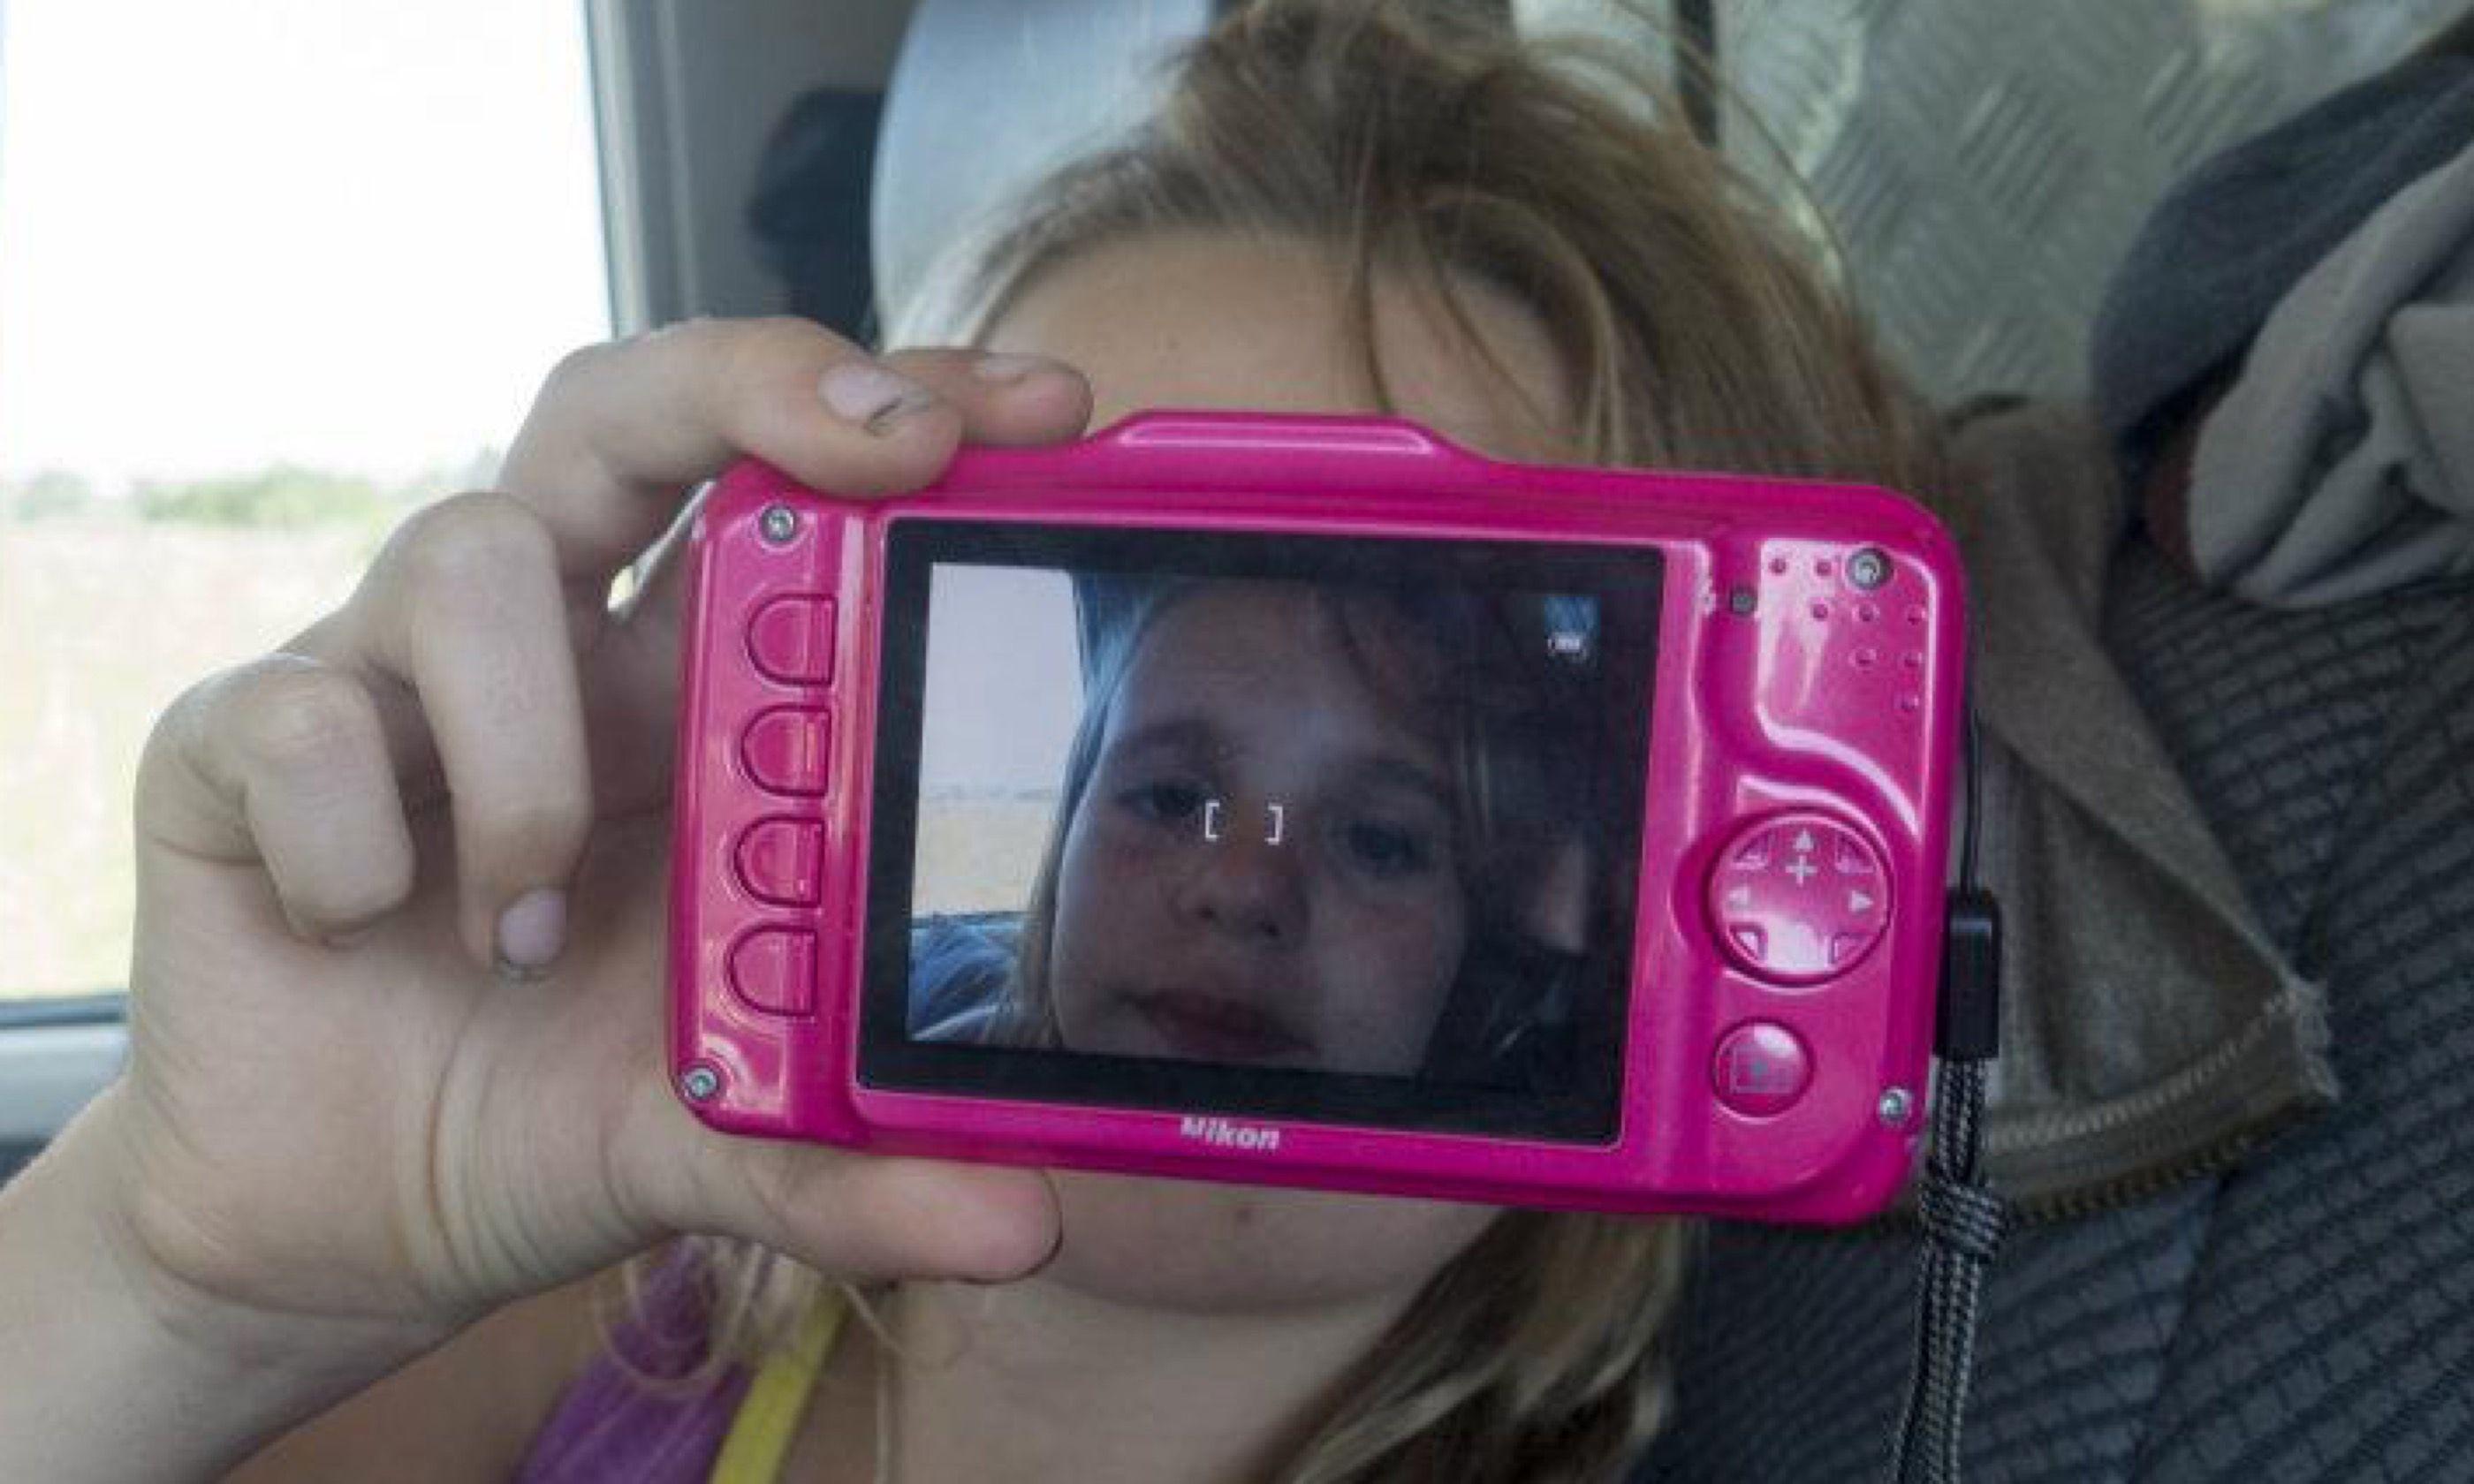 Having fun with a digital camera (Edwina Cagol)